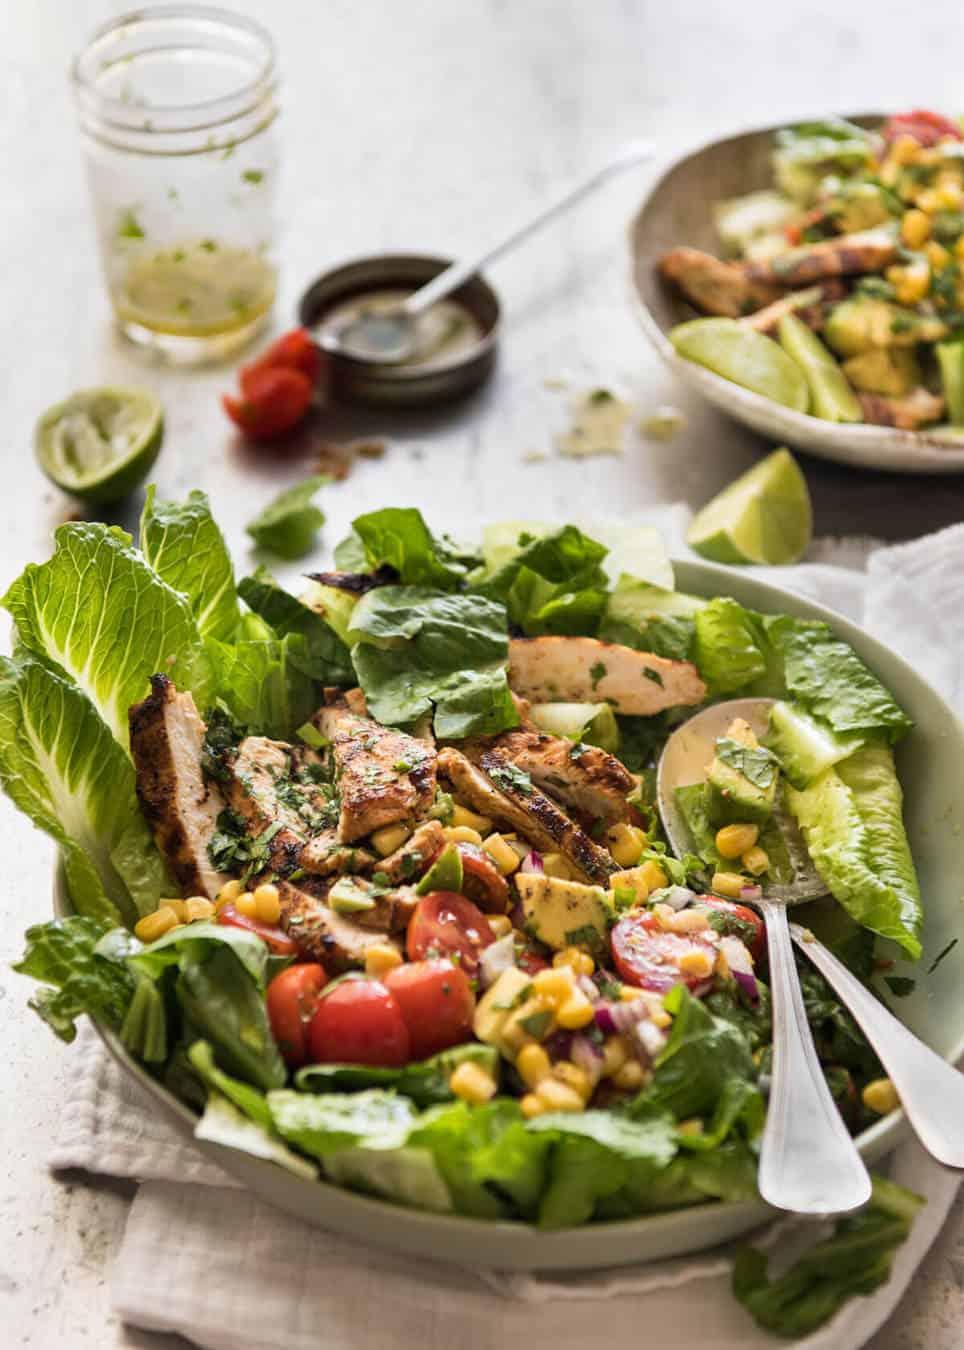 Mexican Chicken Avocado Salad RecipeTin Eats